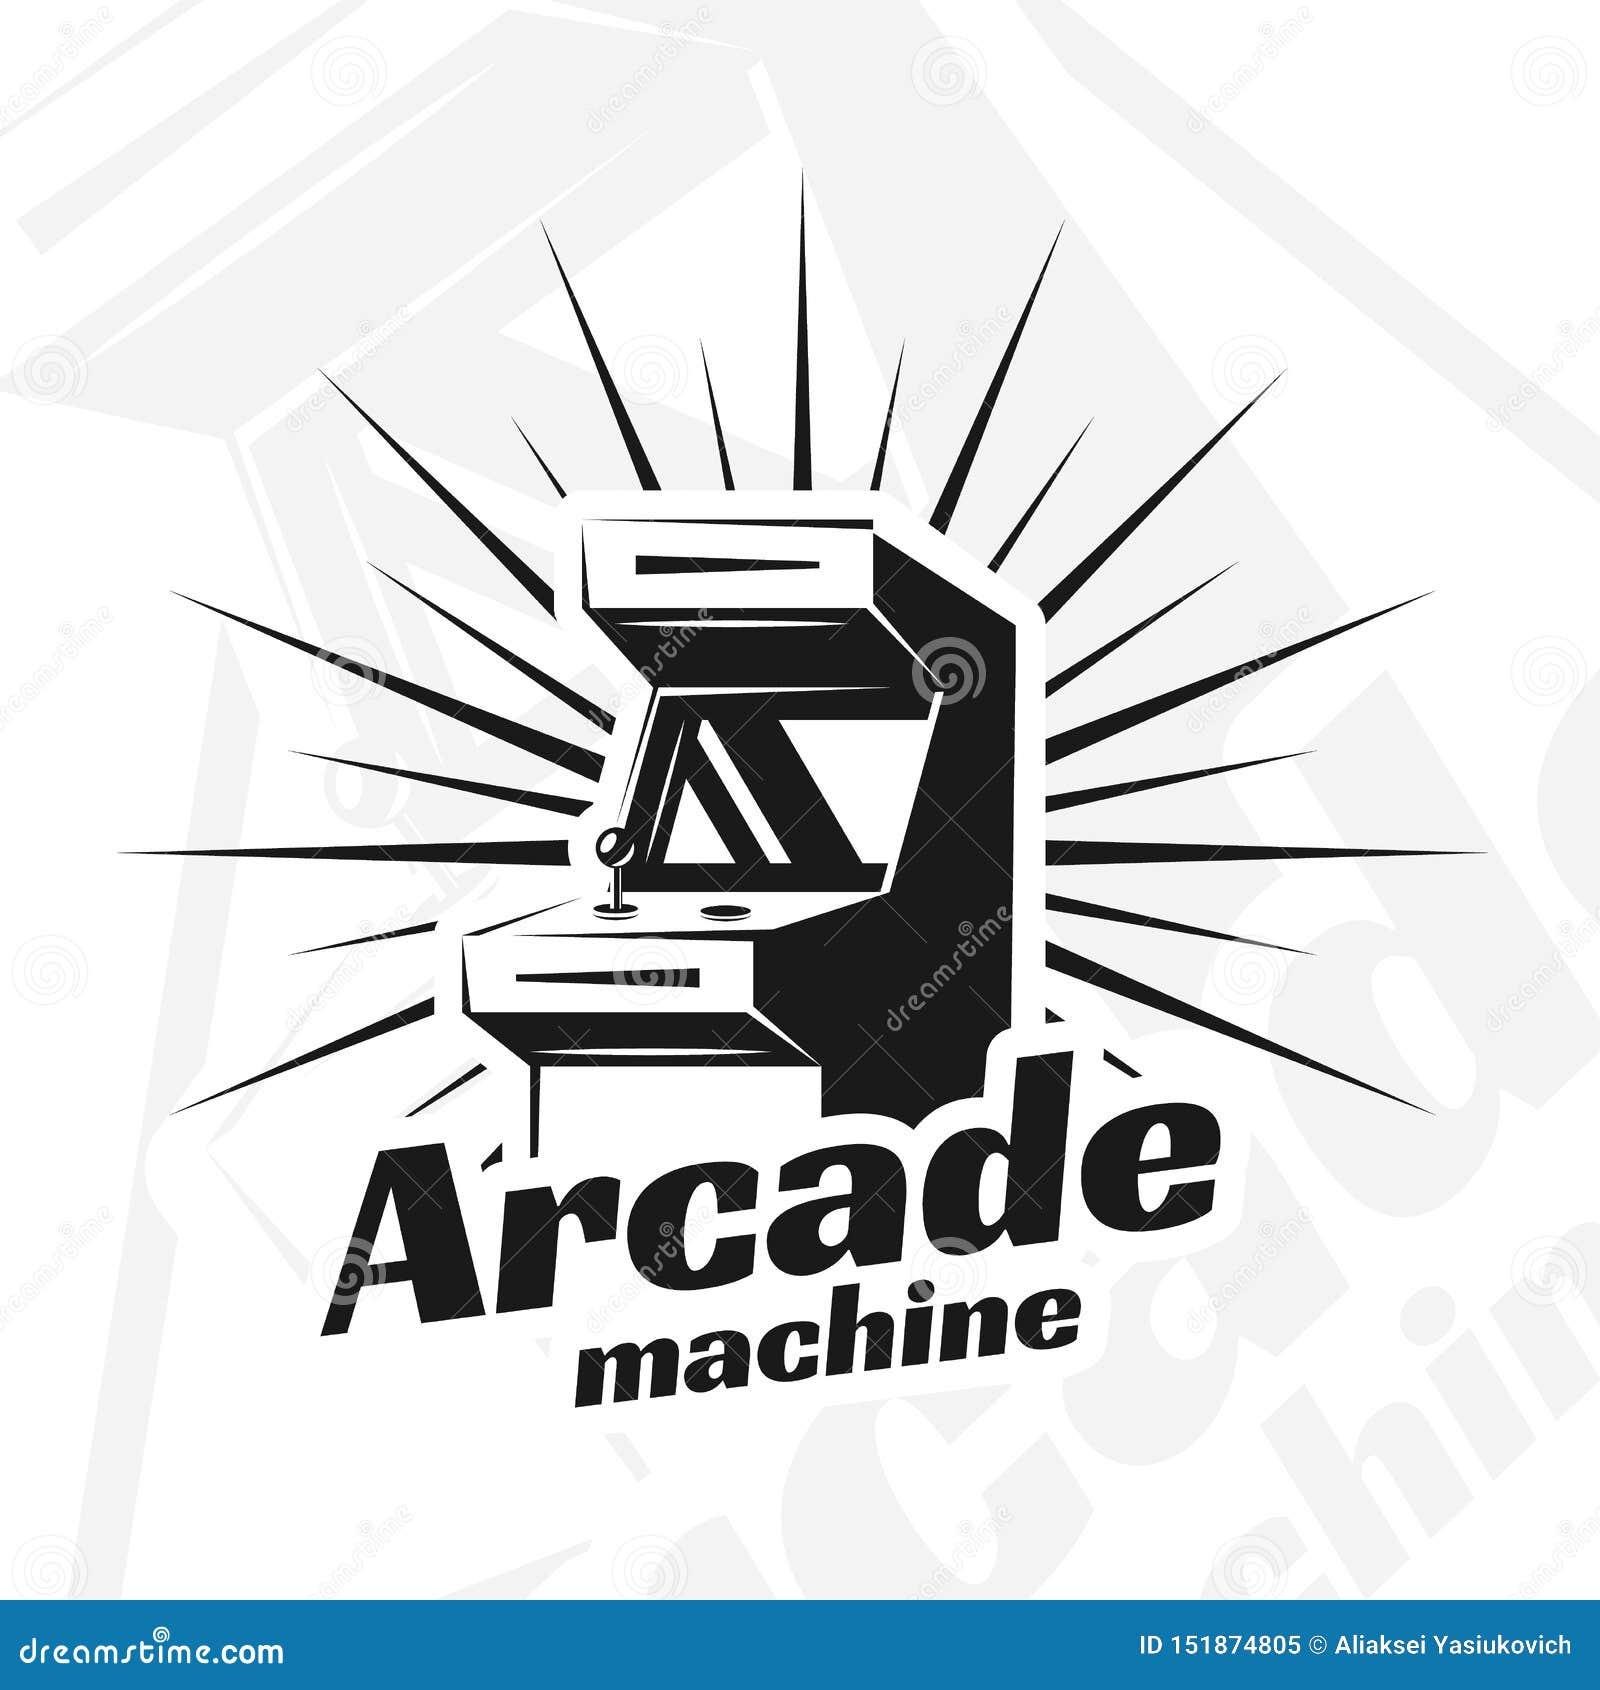 Arcade Machine Vector Stock Vector Illustration Of Electronic 151874805